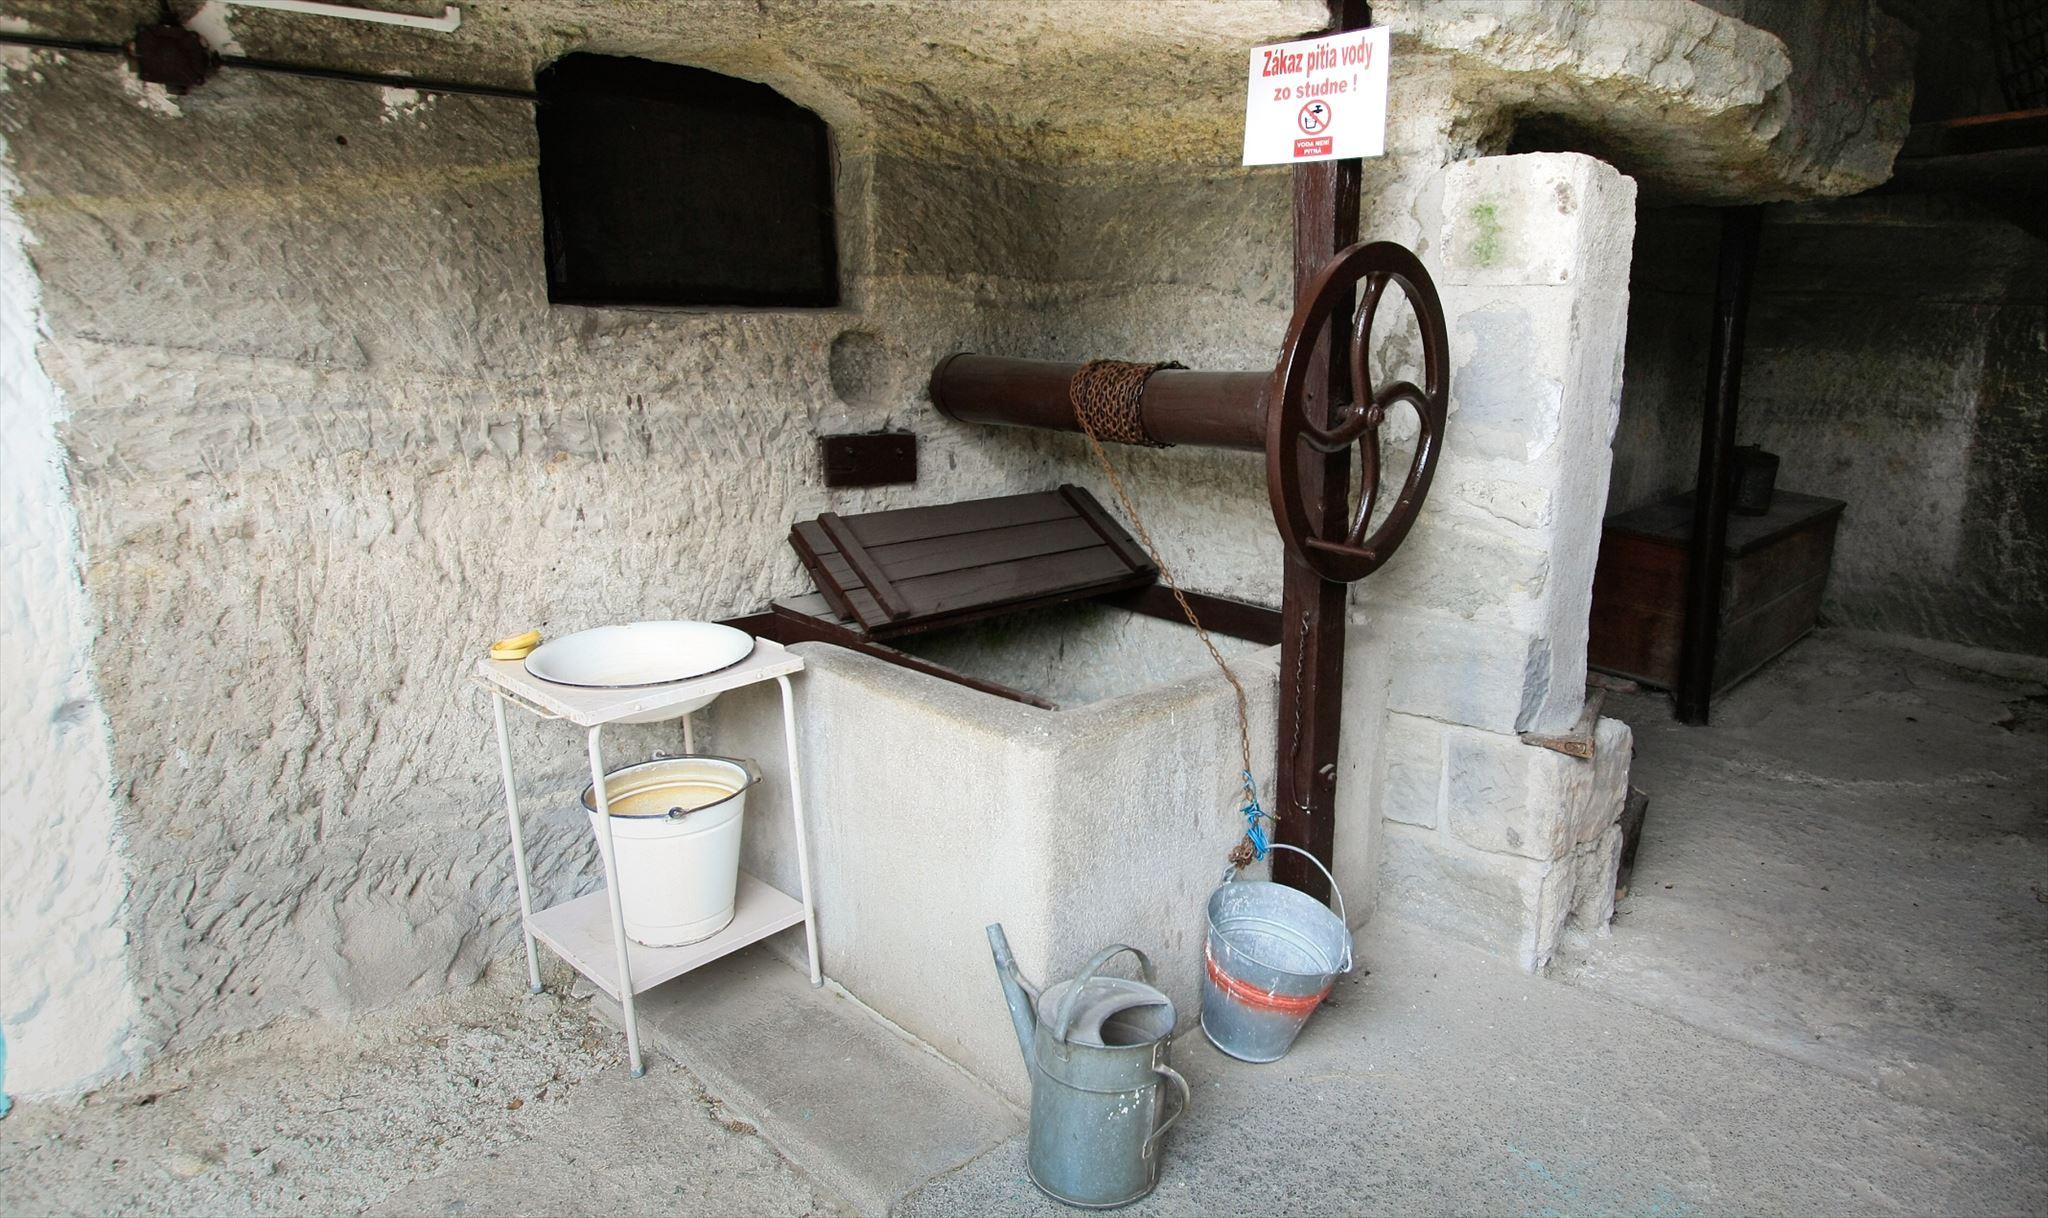 studňa vyhĺbená do tufového kameňa